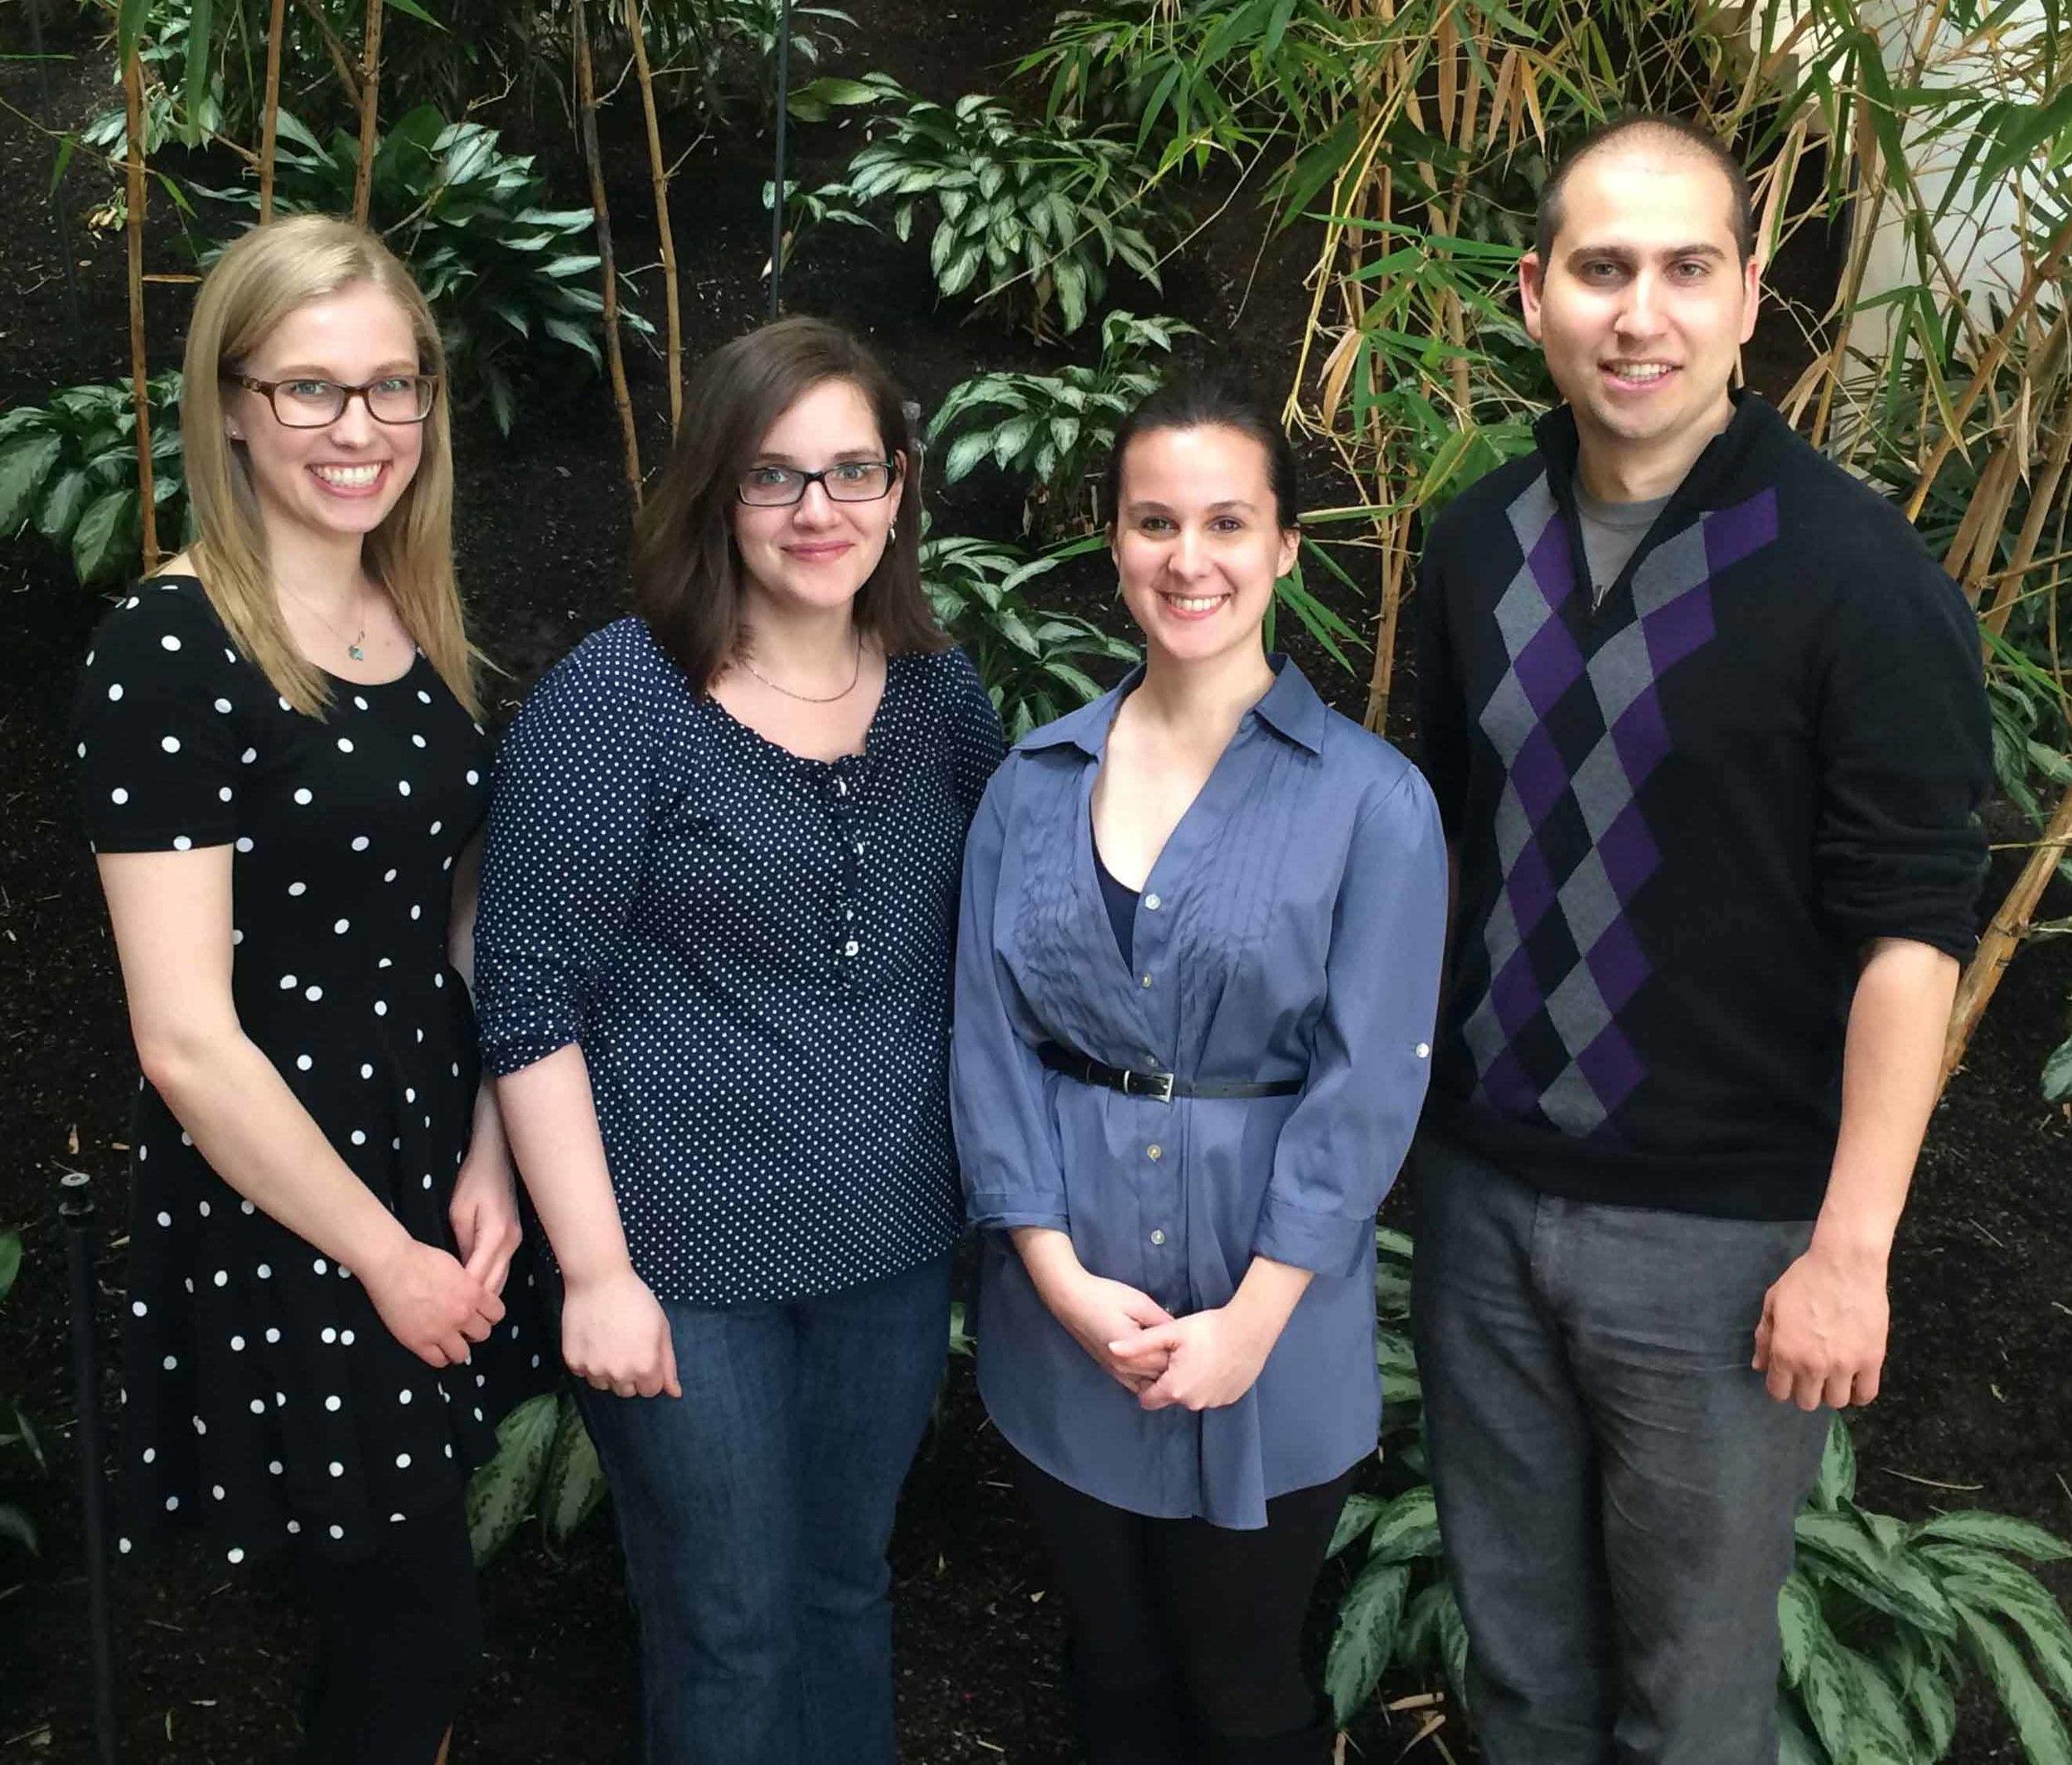 From left to right: Elizabeth Polvi (VP External), Sabrina Stanley (President), Amanda Veri (VP Internal), Eric Chapman (VP Student Life)